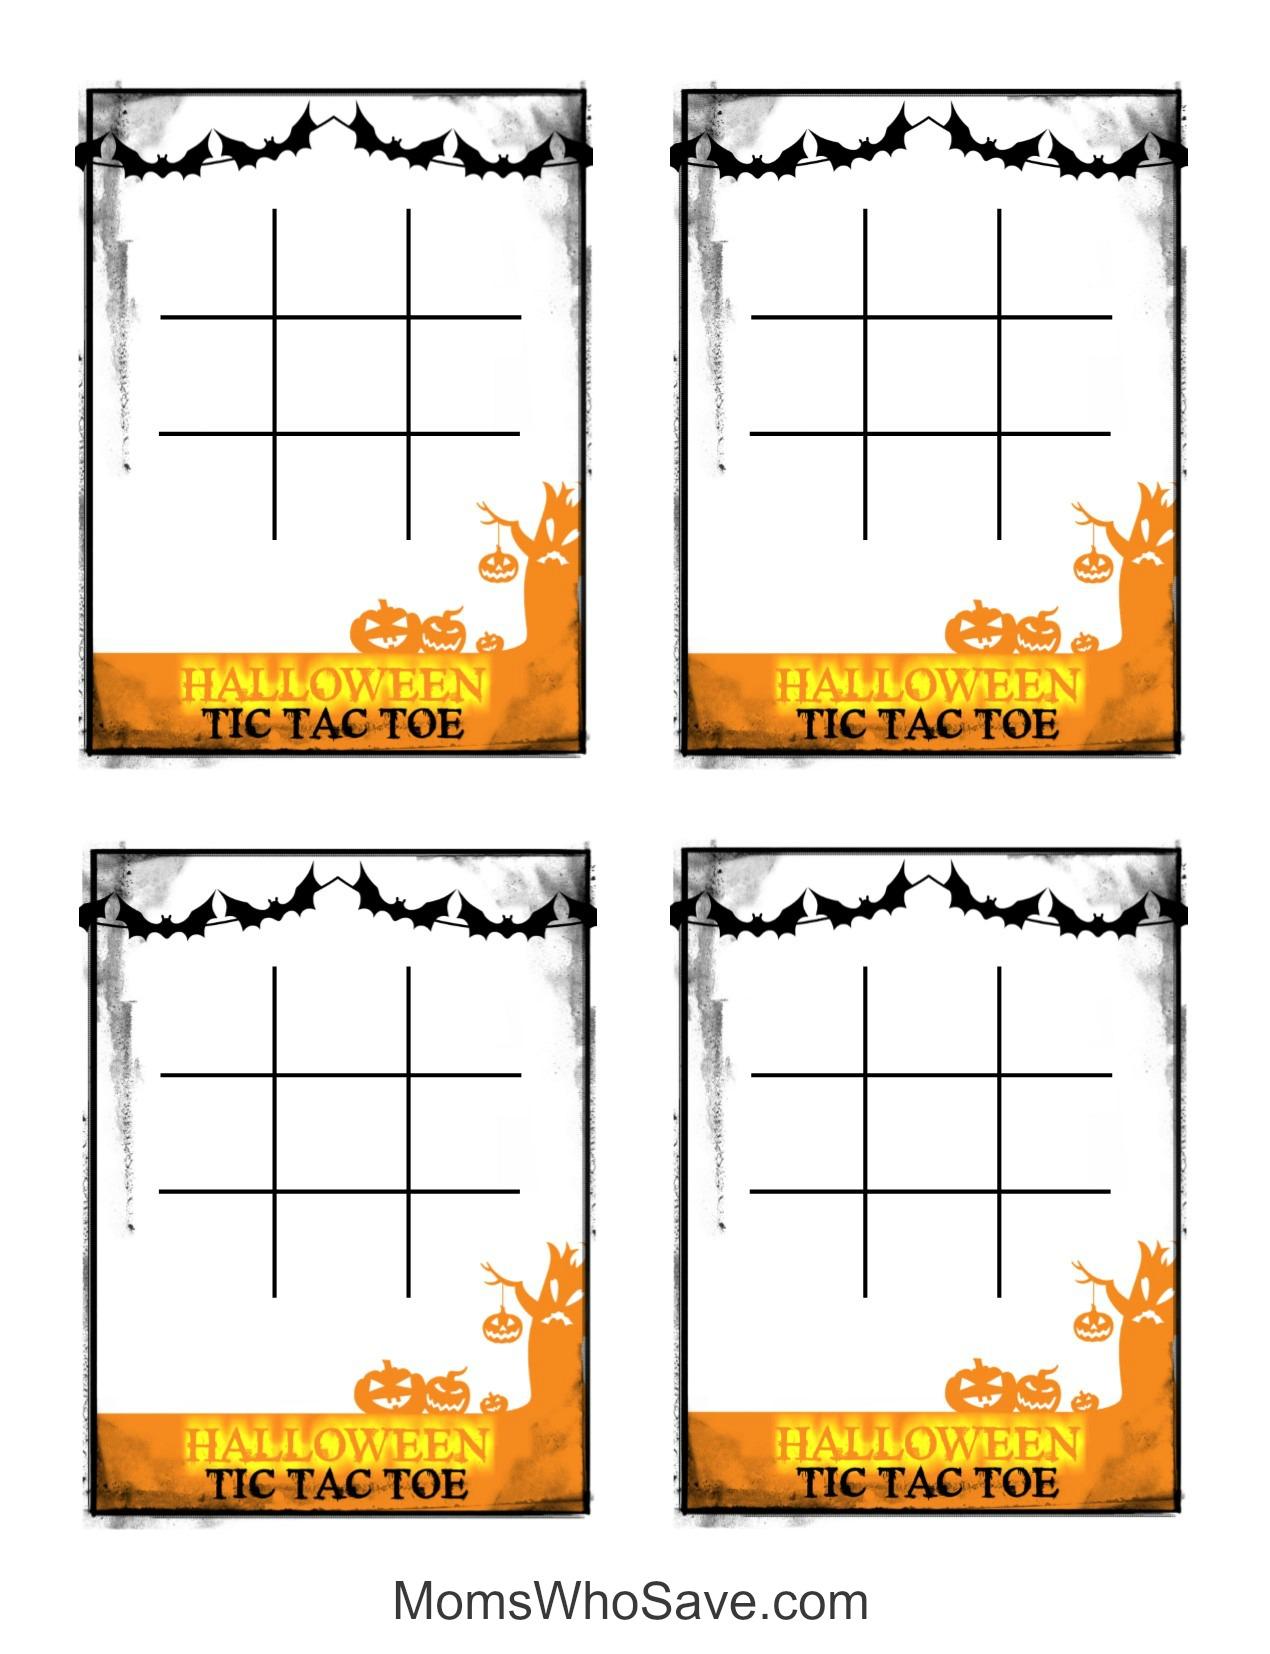 photograph regarding Tic Tac Toe Printable identify Totally free Halloween Tic Tac Toe Printable Match Playing cards